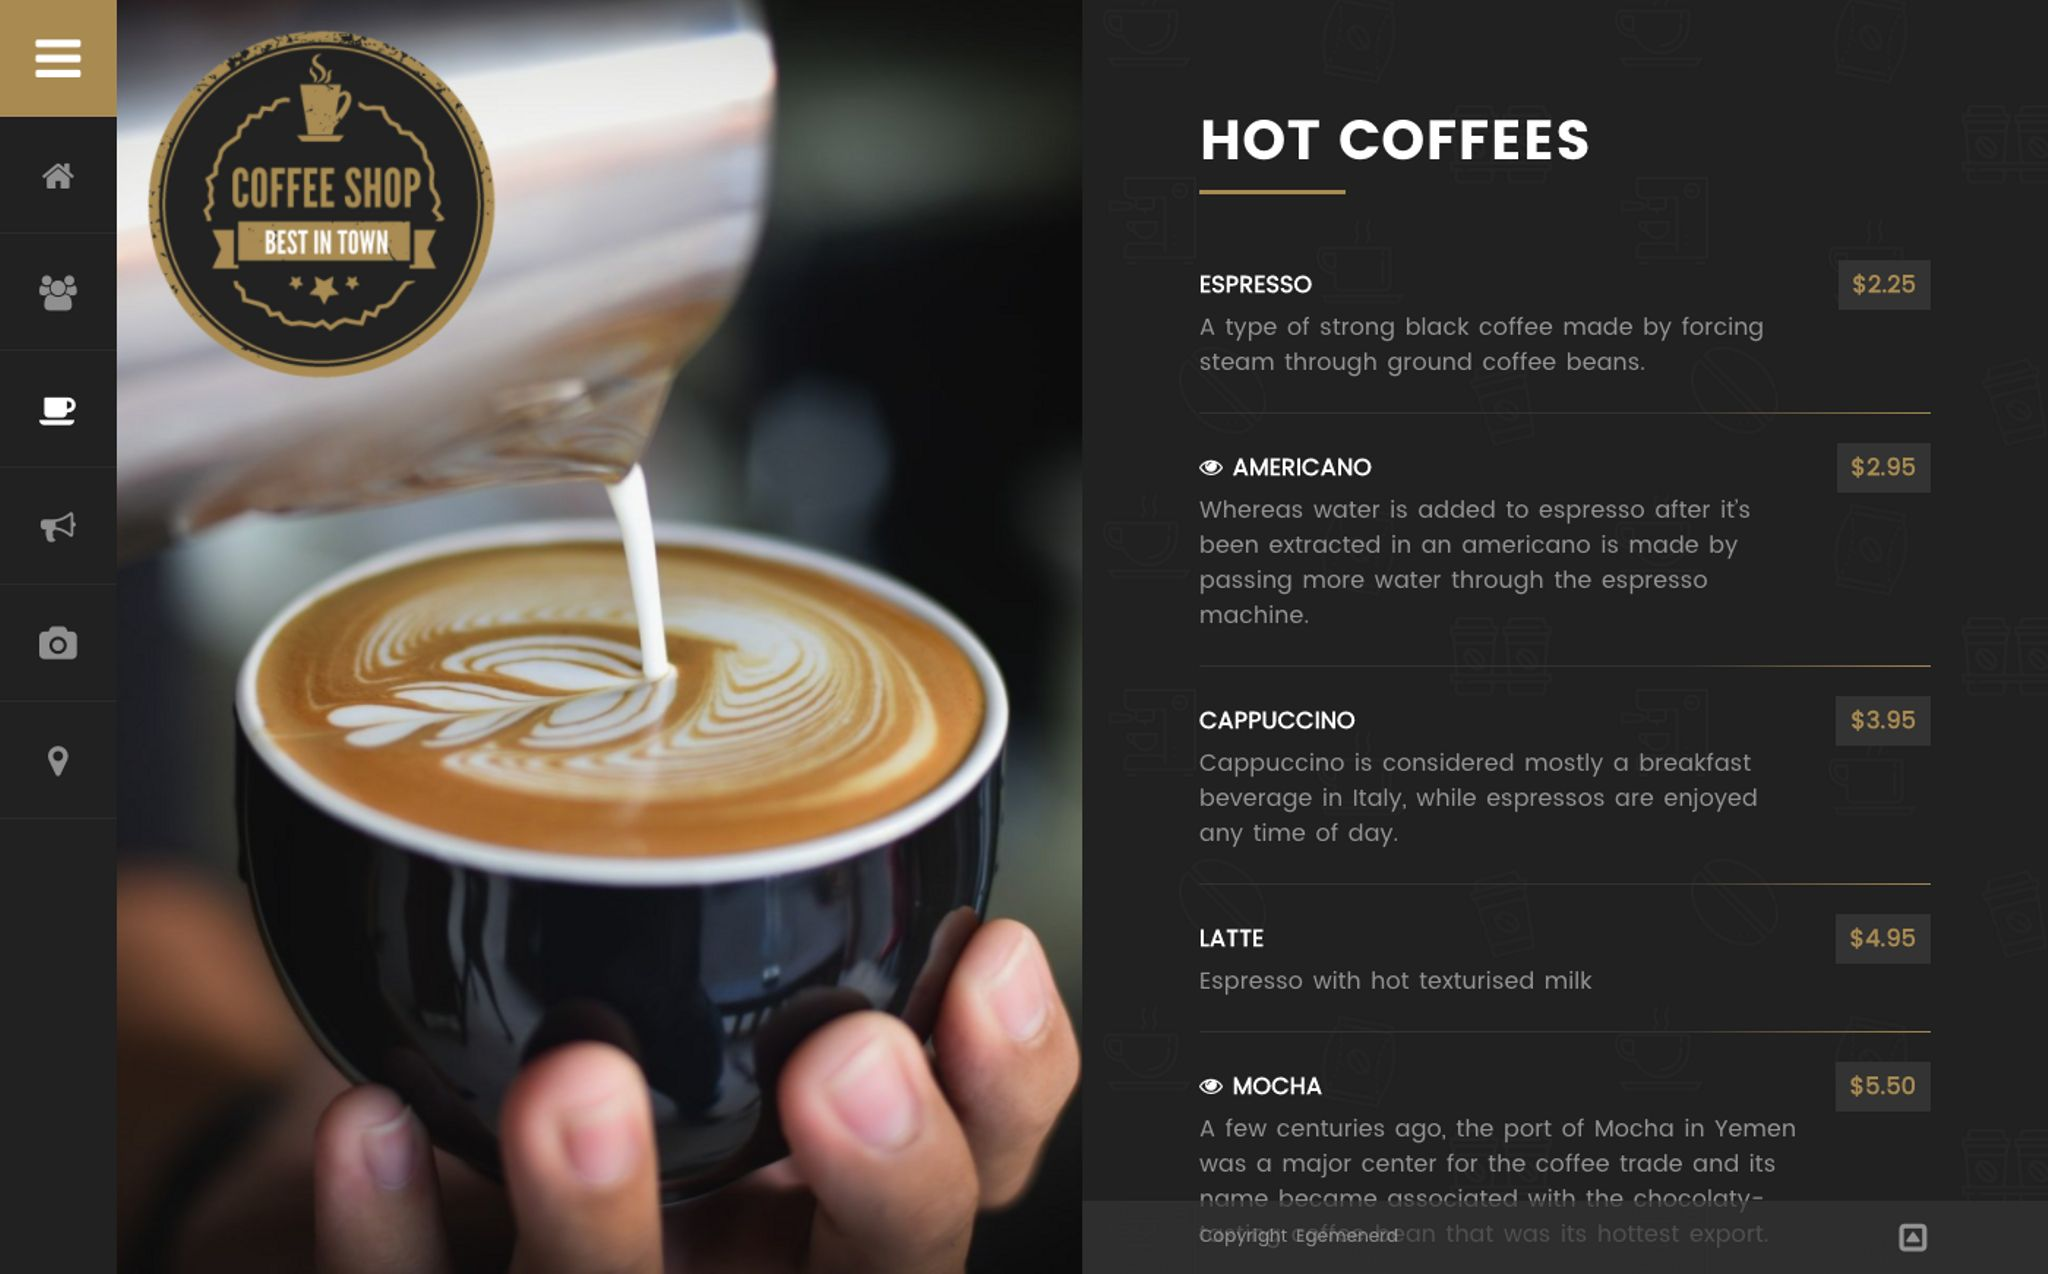 Coffee Shop - Cafe Bar Pub Restaurant WordPress Theme